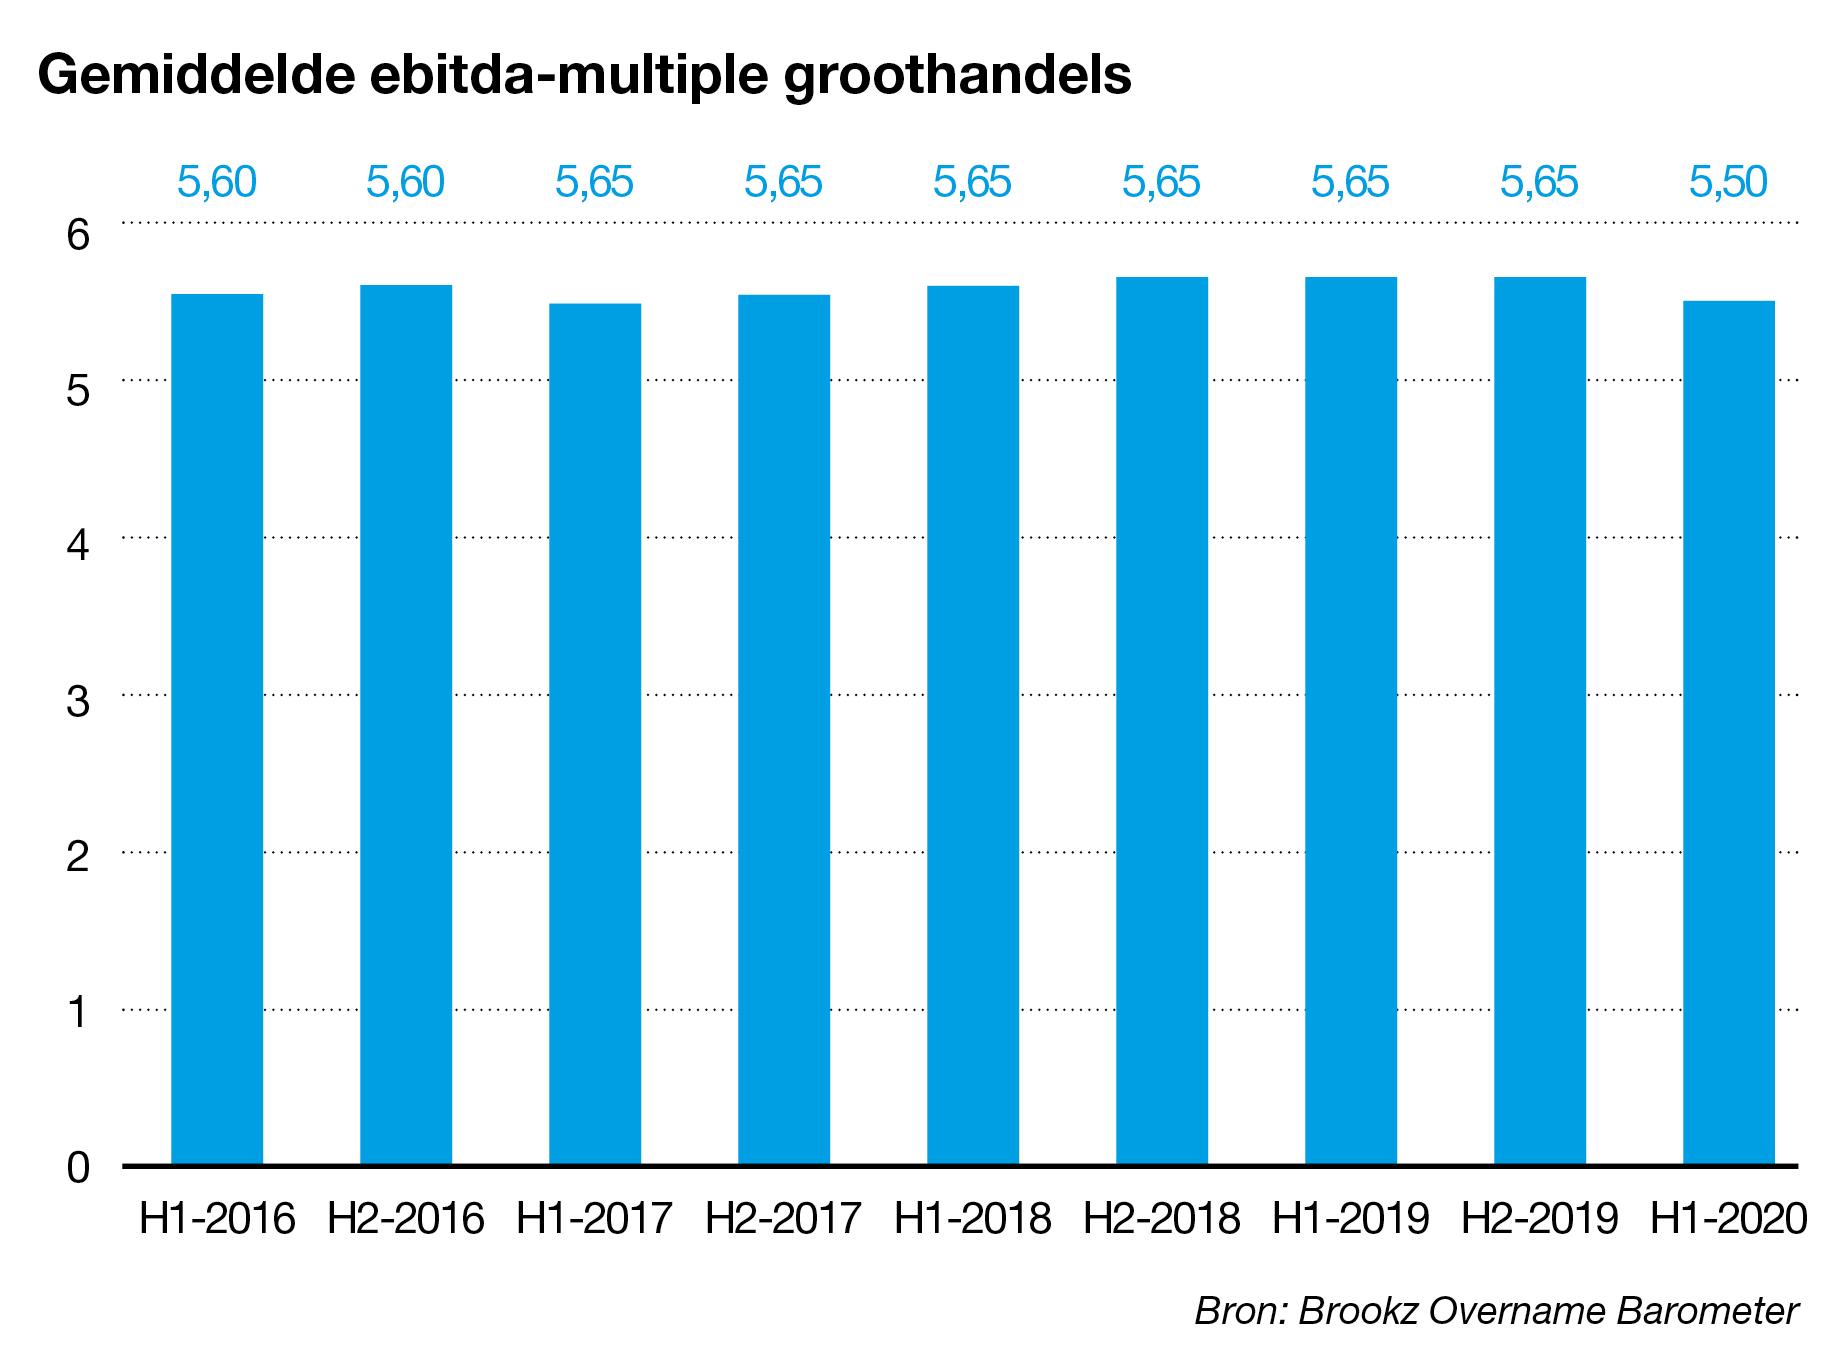 Ebitda-multiple groothandels